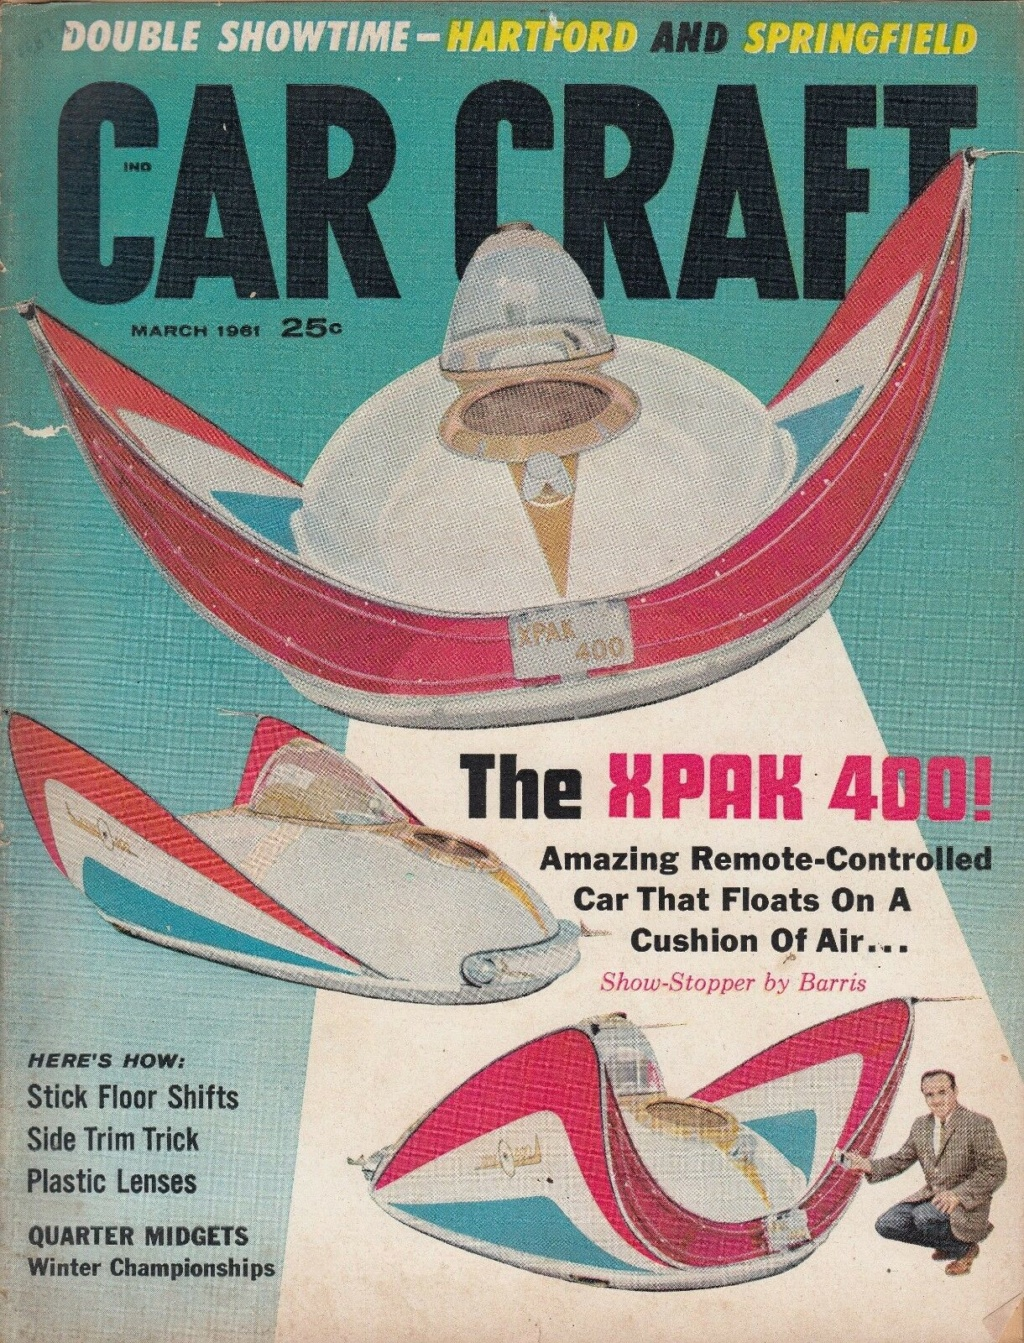 XPAK 400  - George Barris Carcra11